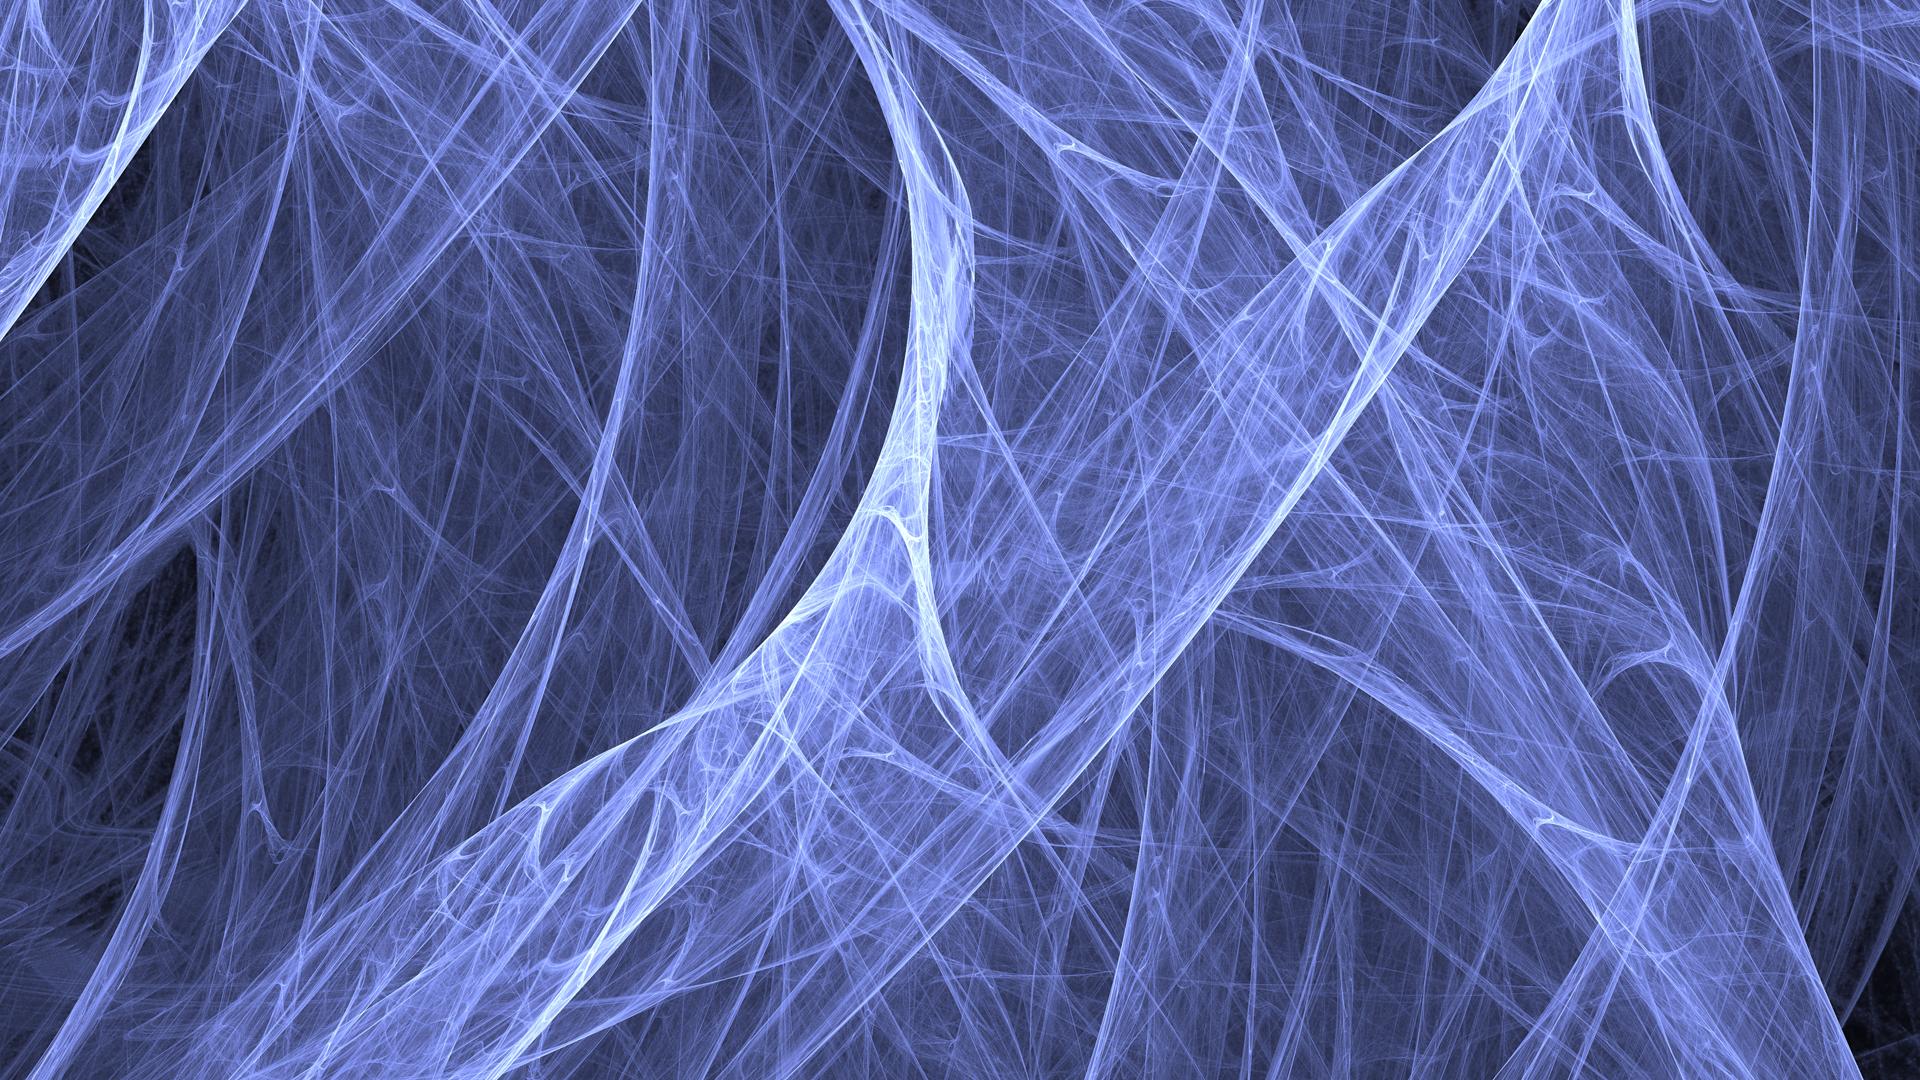 BurraMundi Spider Webs DesktopWallpaper 1920x1080